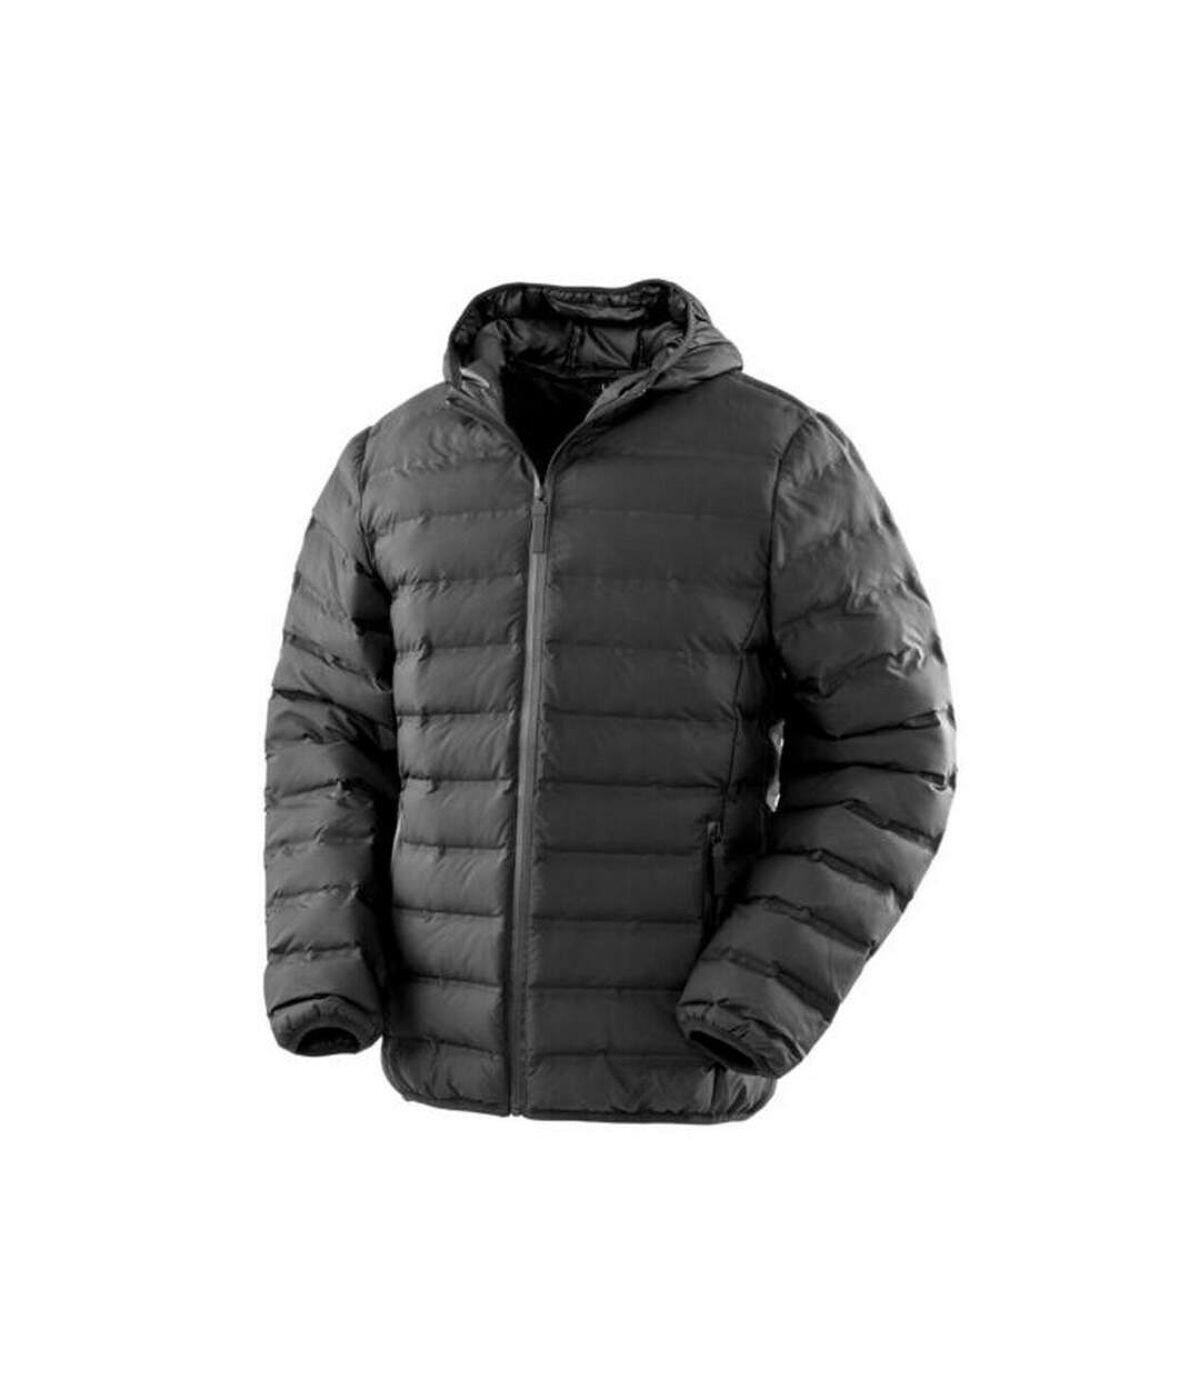 Result Mens Urban Outdoor Ultrasonic Hooded Coat (Black) - UTRW7056